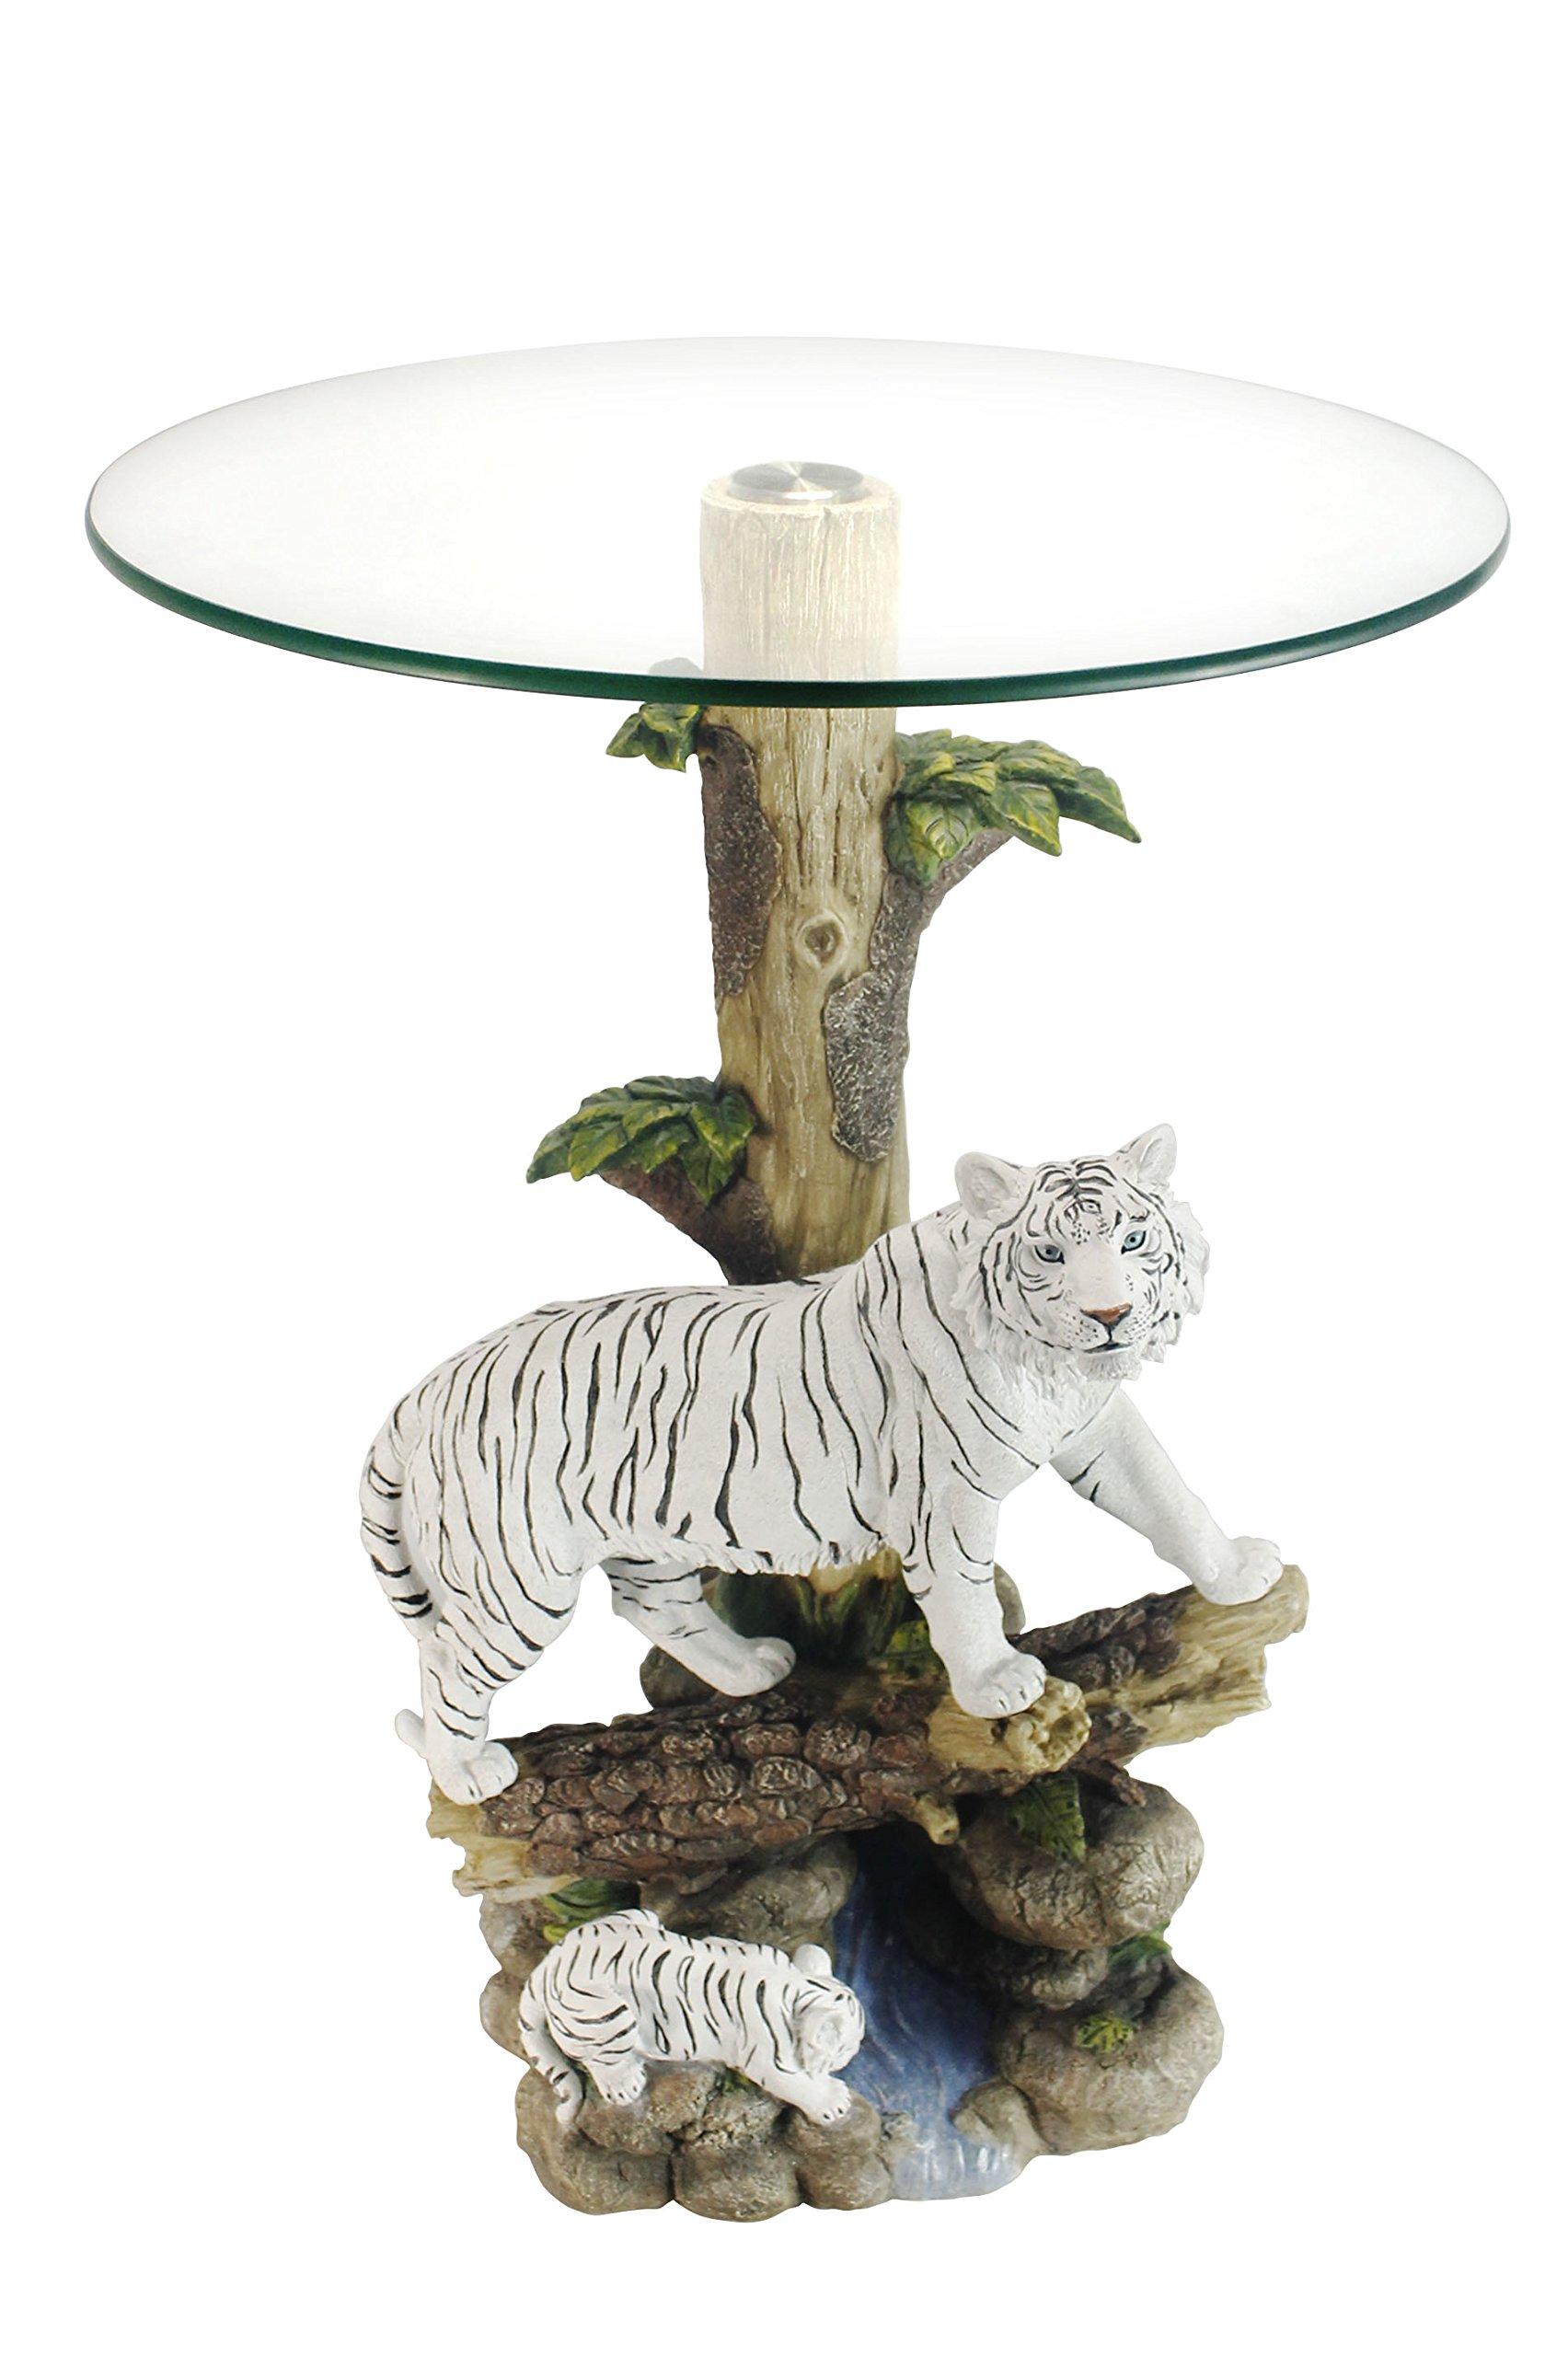 OK Lighting OK-0732N Animal Sculpture End Table 24'' H Glass Top Color Sculpture End Table - Tiger